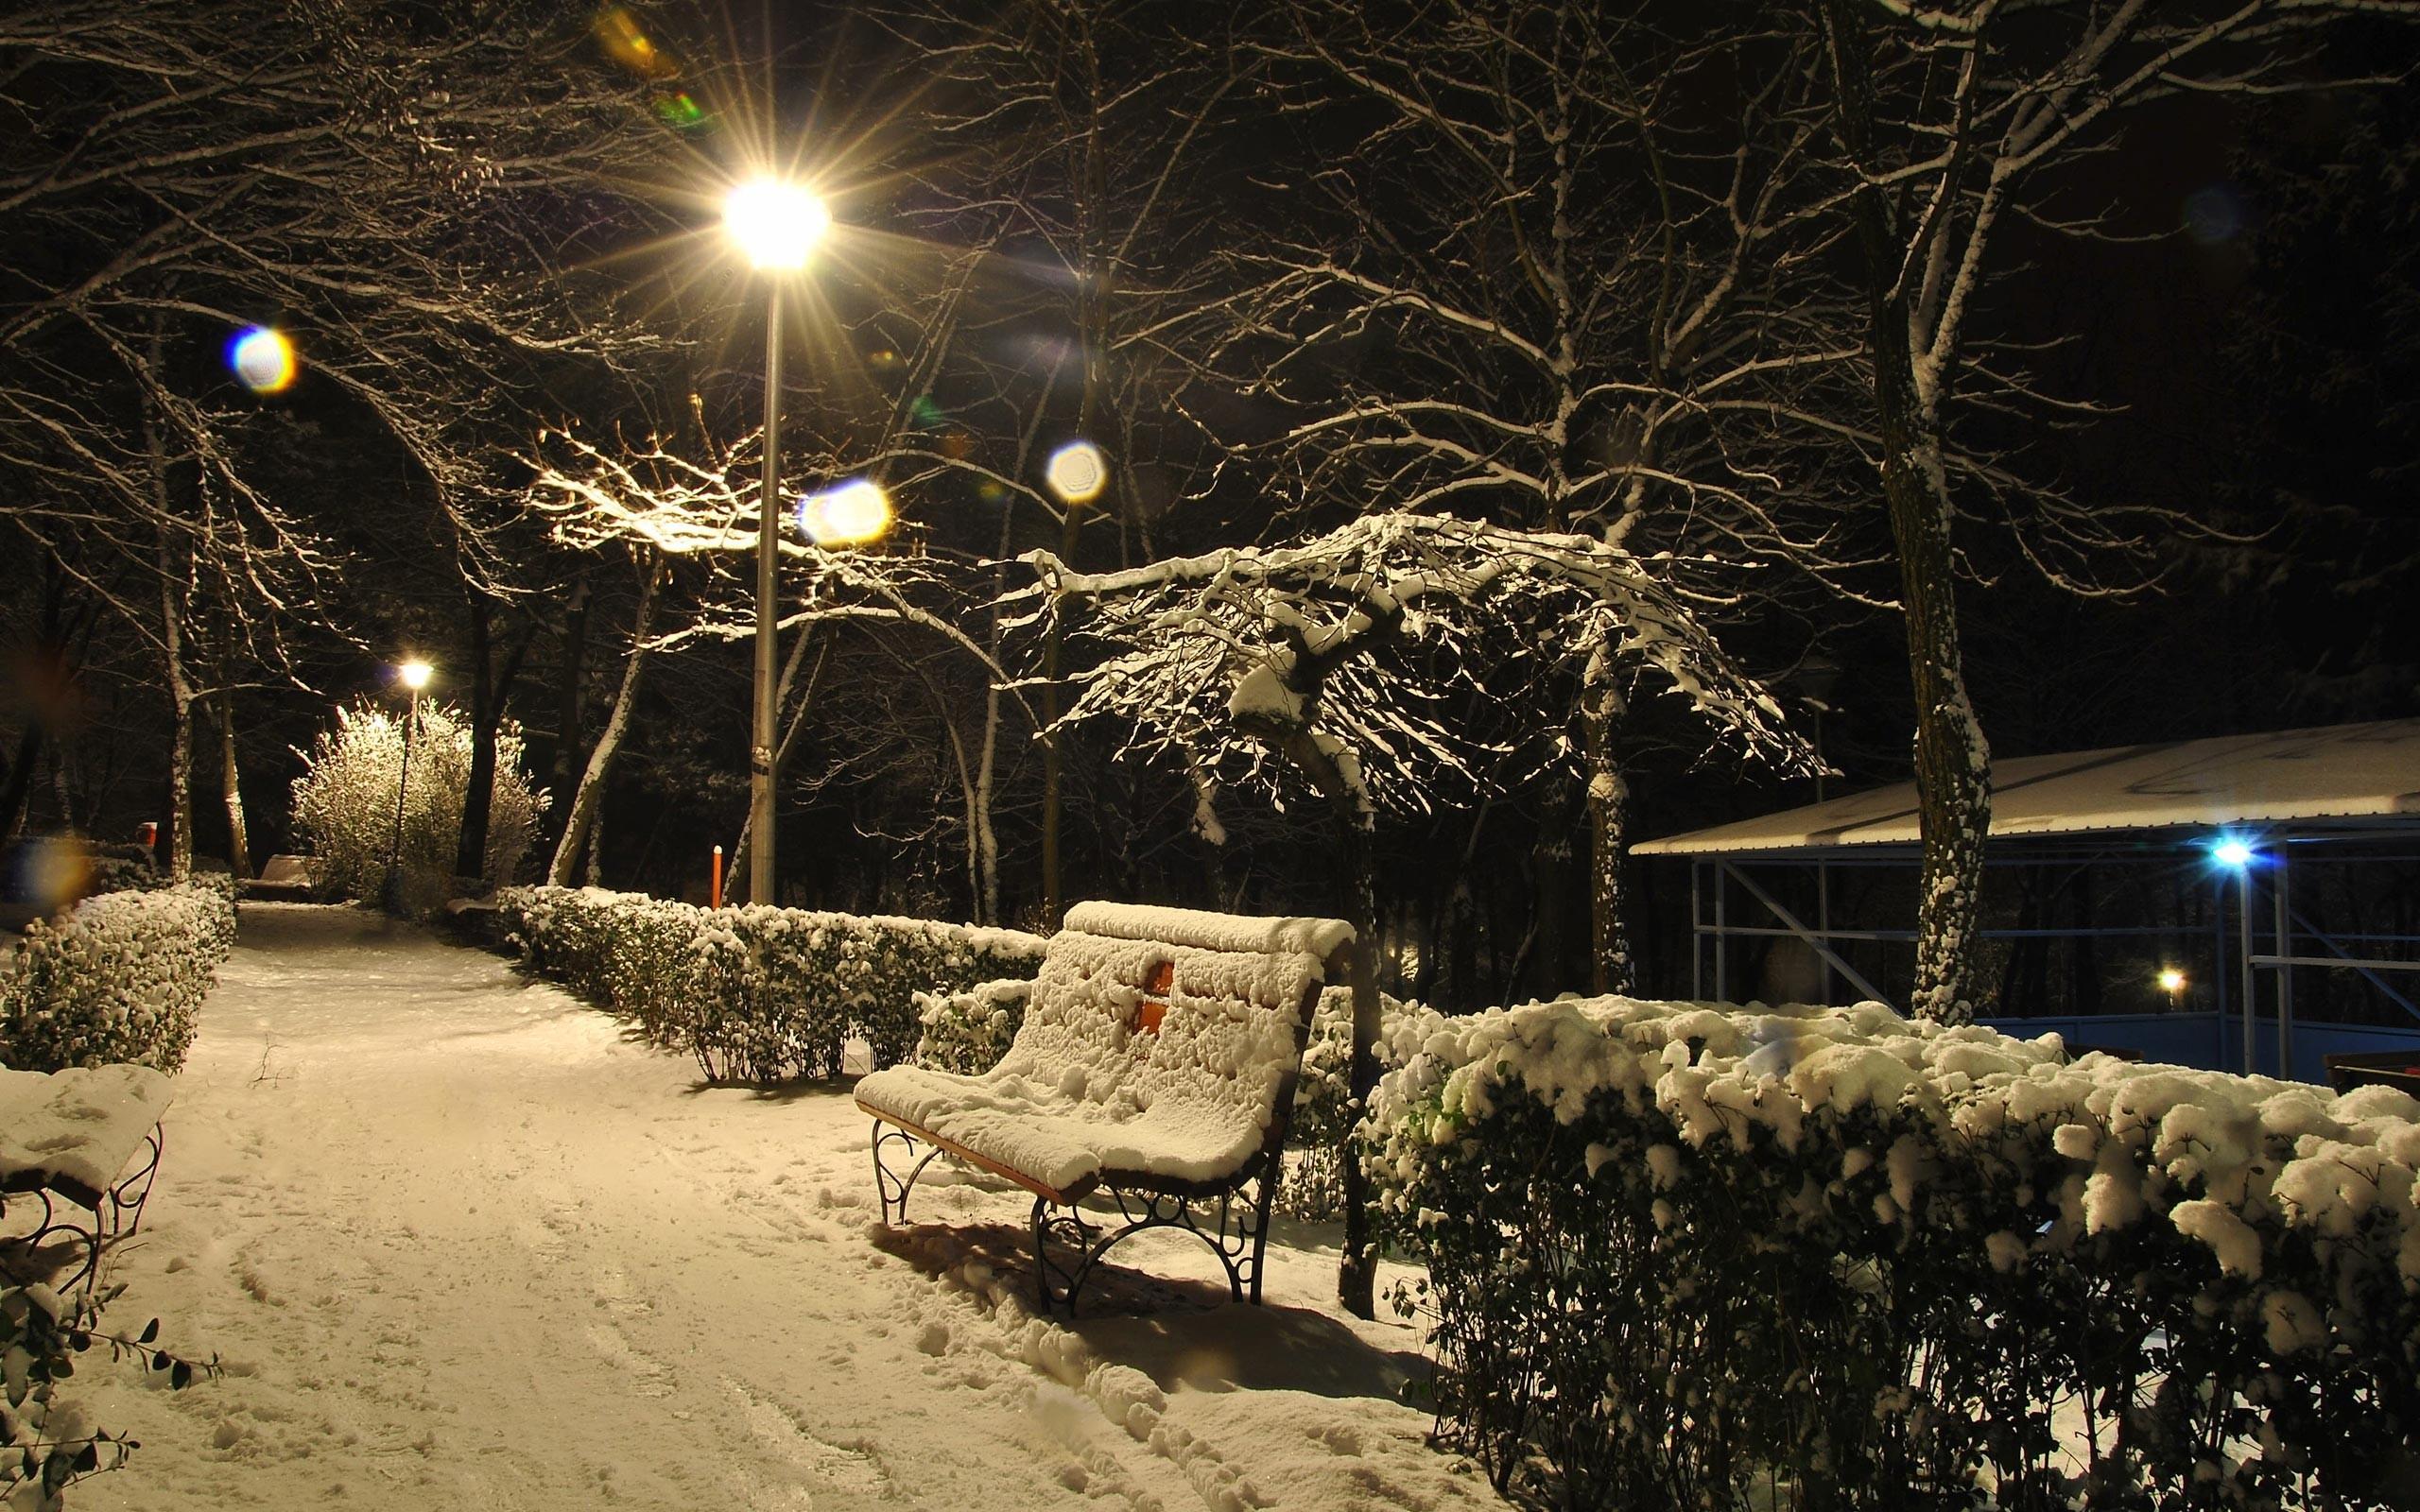 nature winter night wallpapers hd walljpegcom 2560x1600